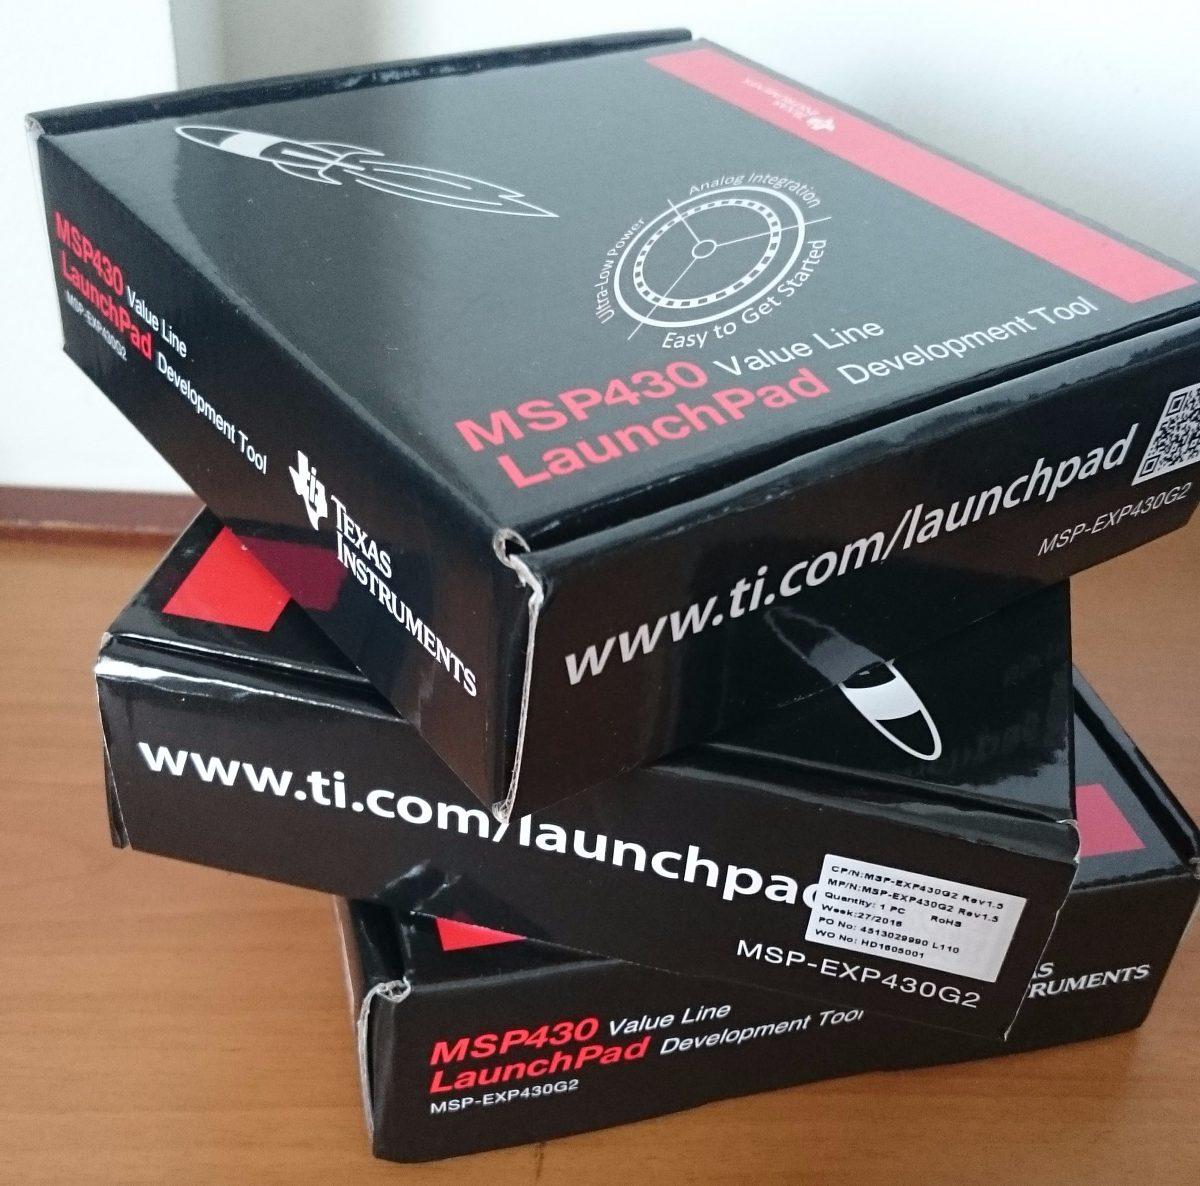 Kit Msp430 Placa Desenvolvimento + 3 Msp430g2553 Extras